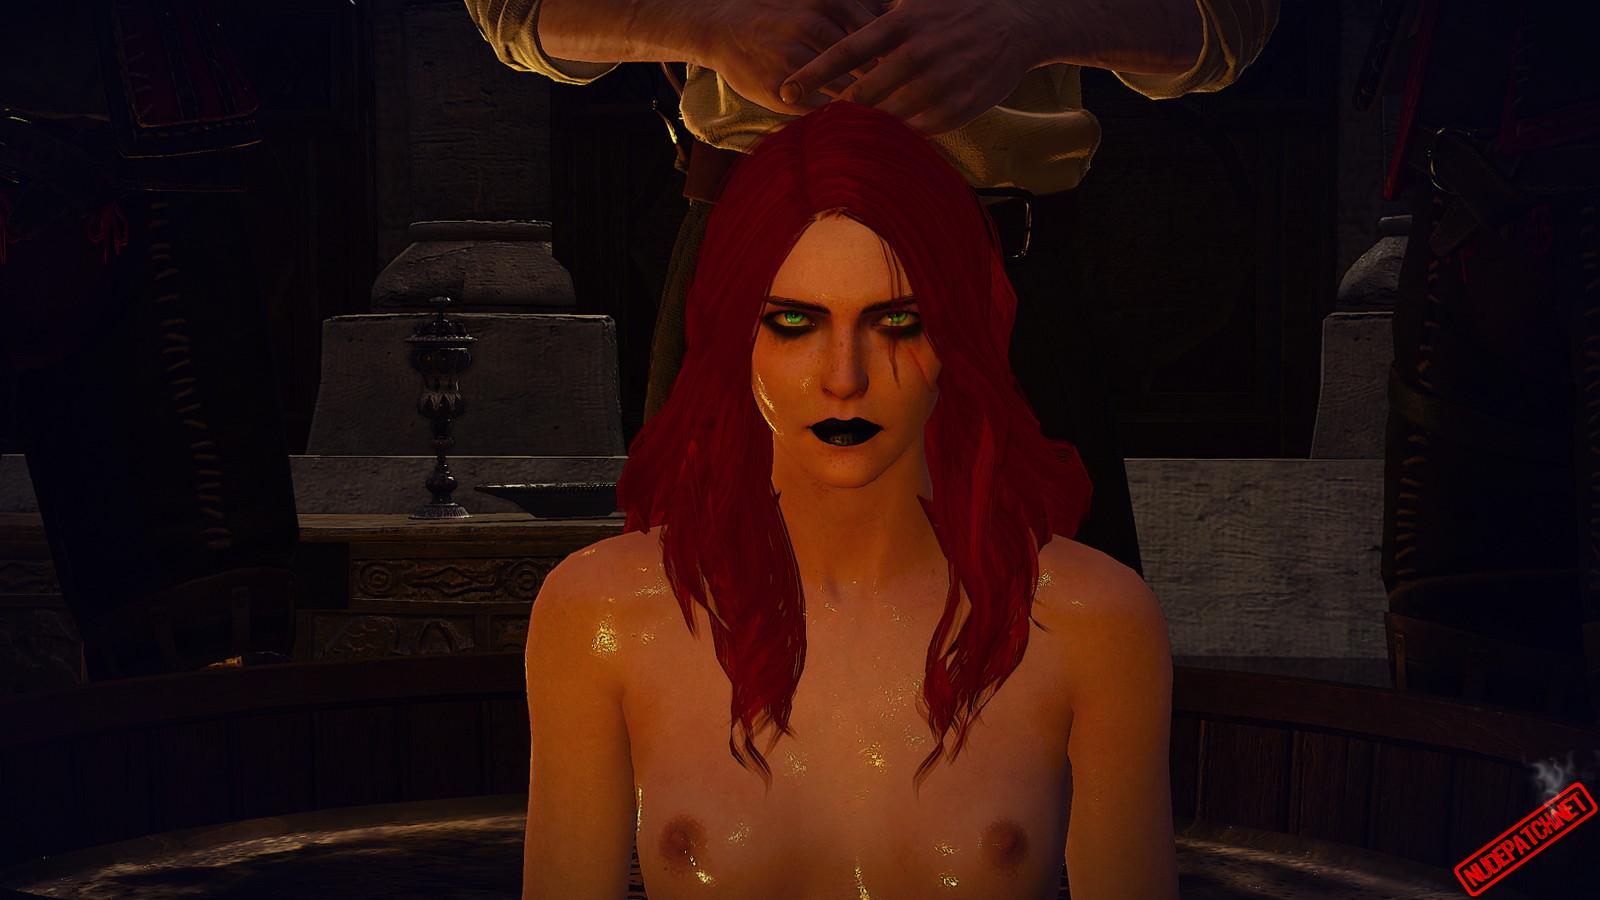 Redhead pics nude Nude Redhead